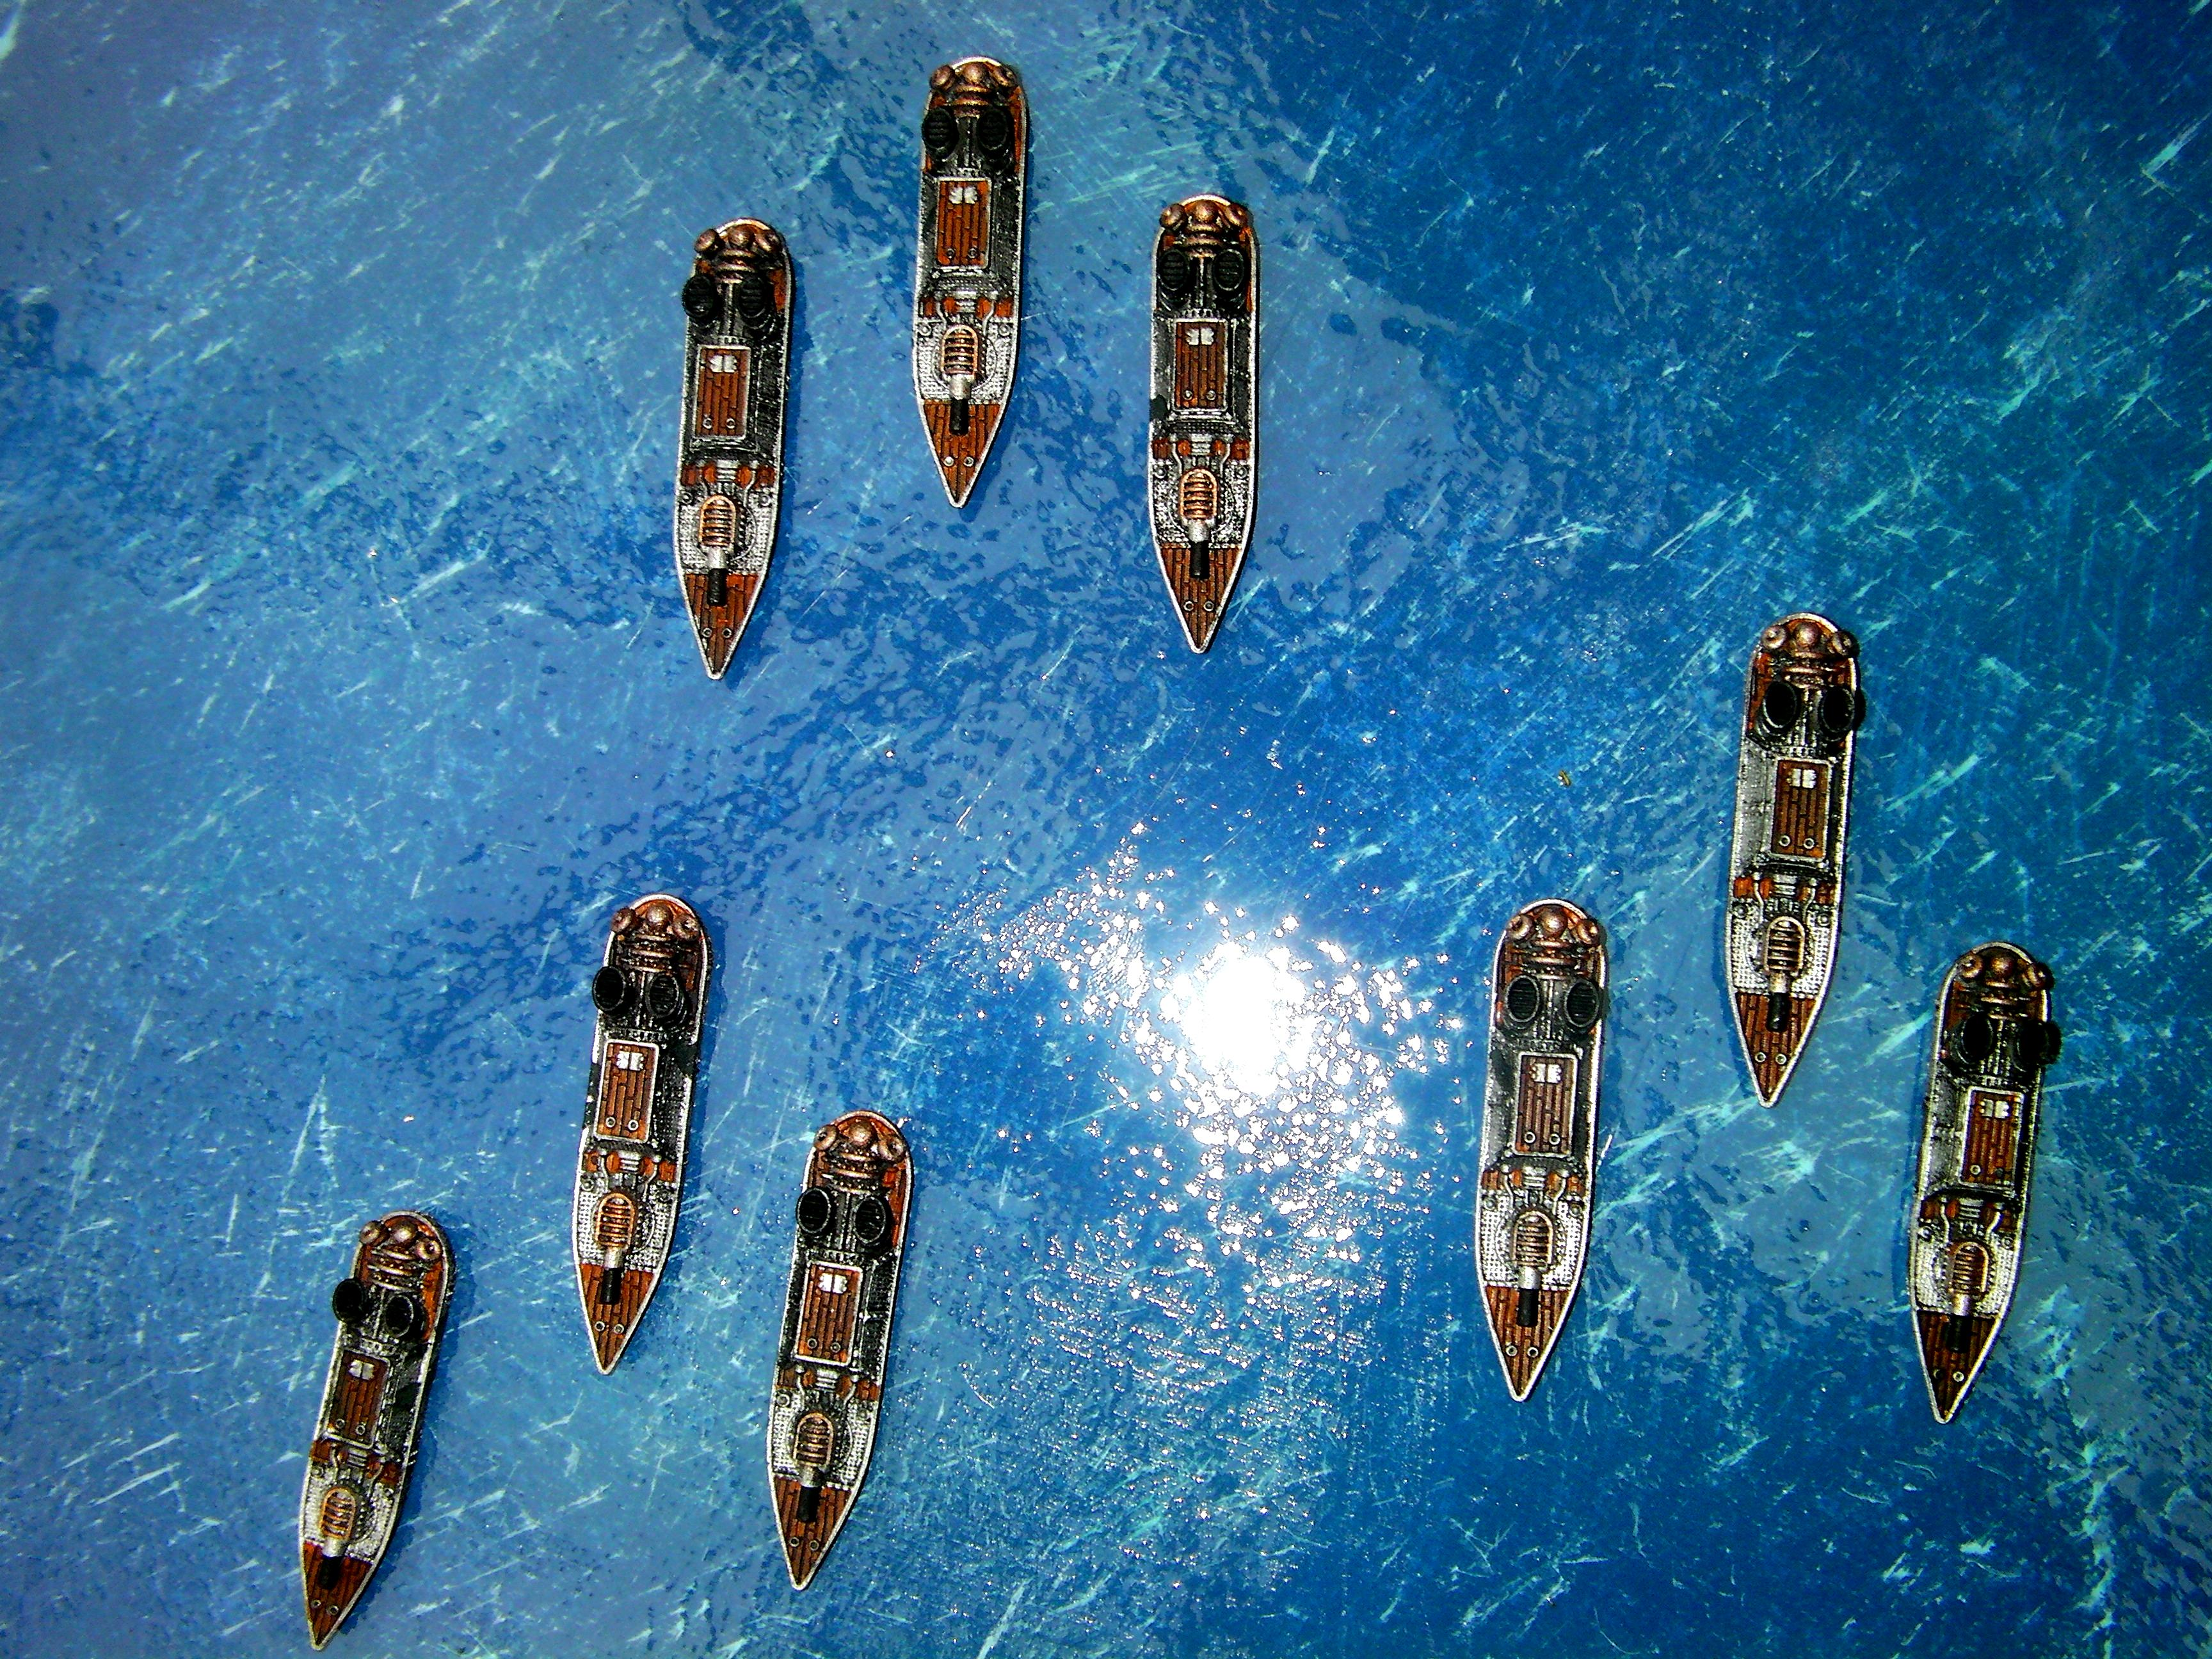 Arminus, Arminus Class, Arminus Frigate, Dystopia, Dystopian, Dystopian Wars, Dystopian-wars, Fleets, Frigate, German Frigate, Germans, Kingdom Of Prussian, Prussian, Prussian Frigate, Sailing, Ships, Spartan Games, War